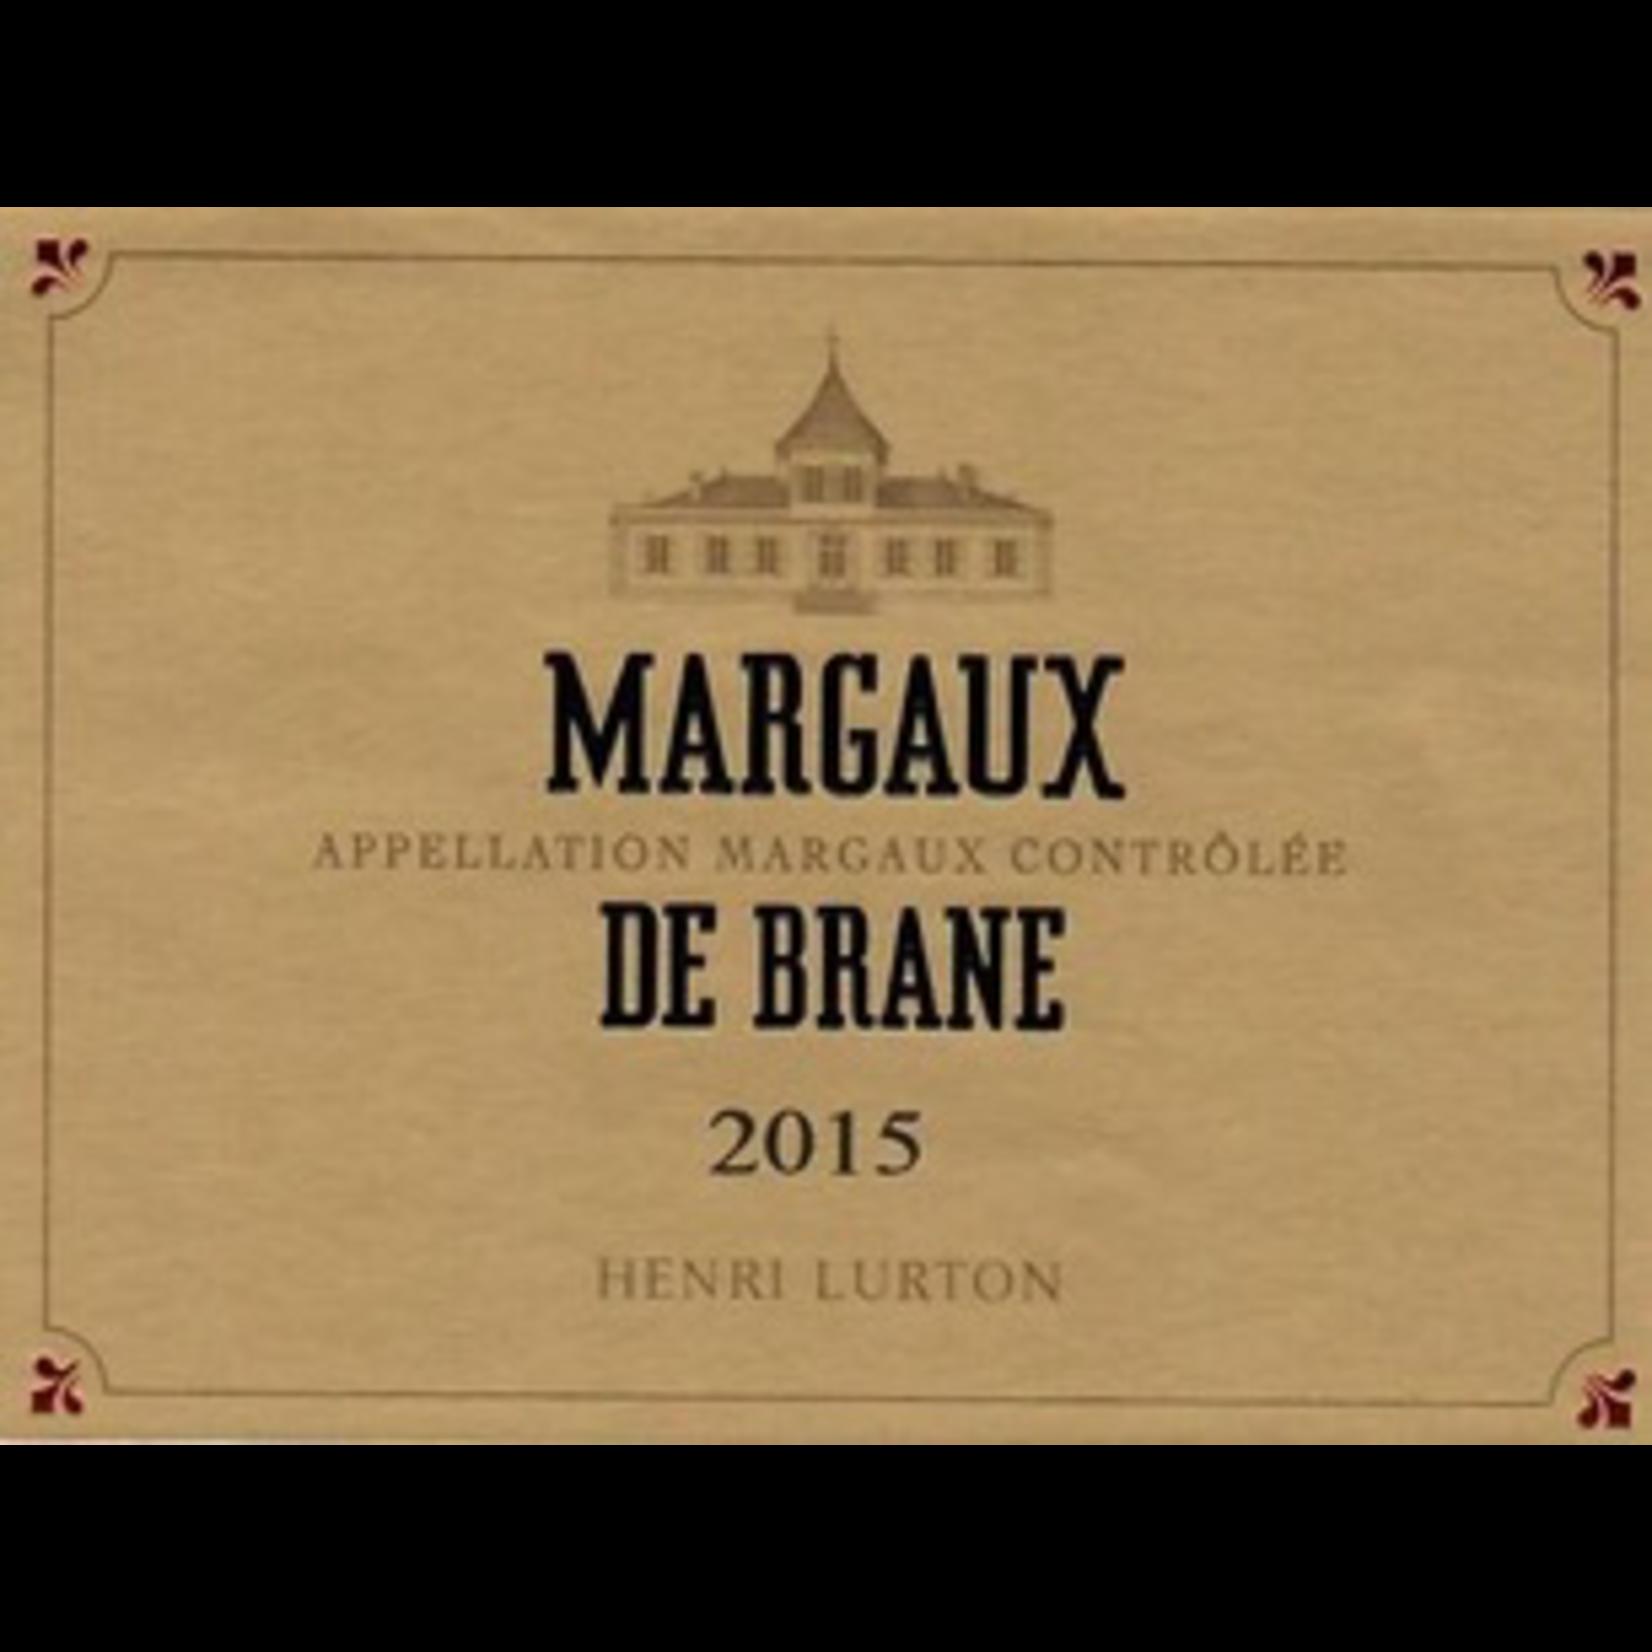 Wine Chateau Brane Cantenac Margaux de Brane 2015